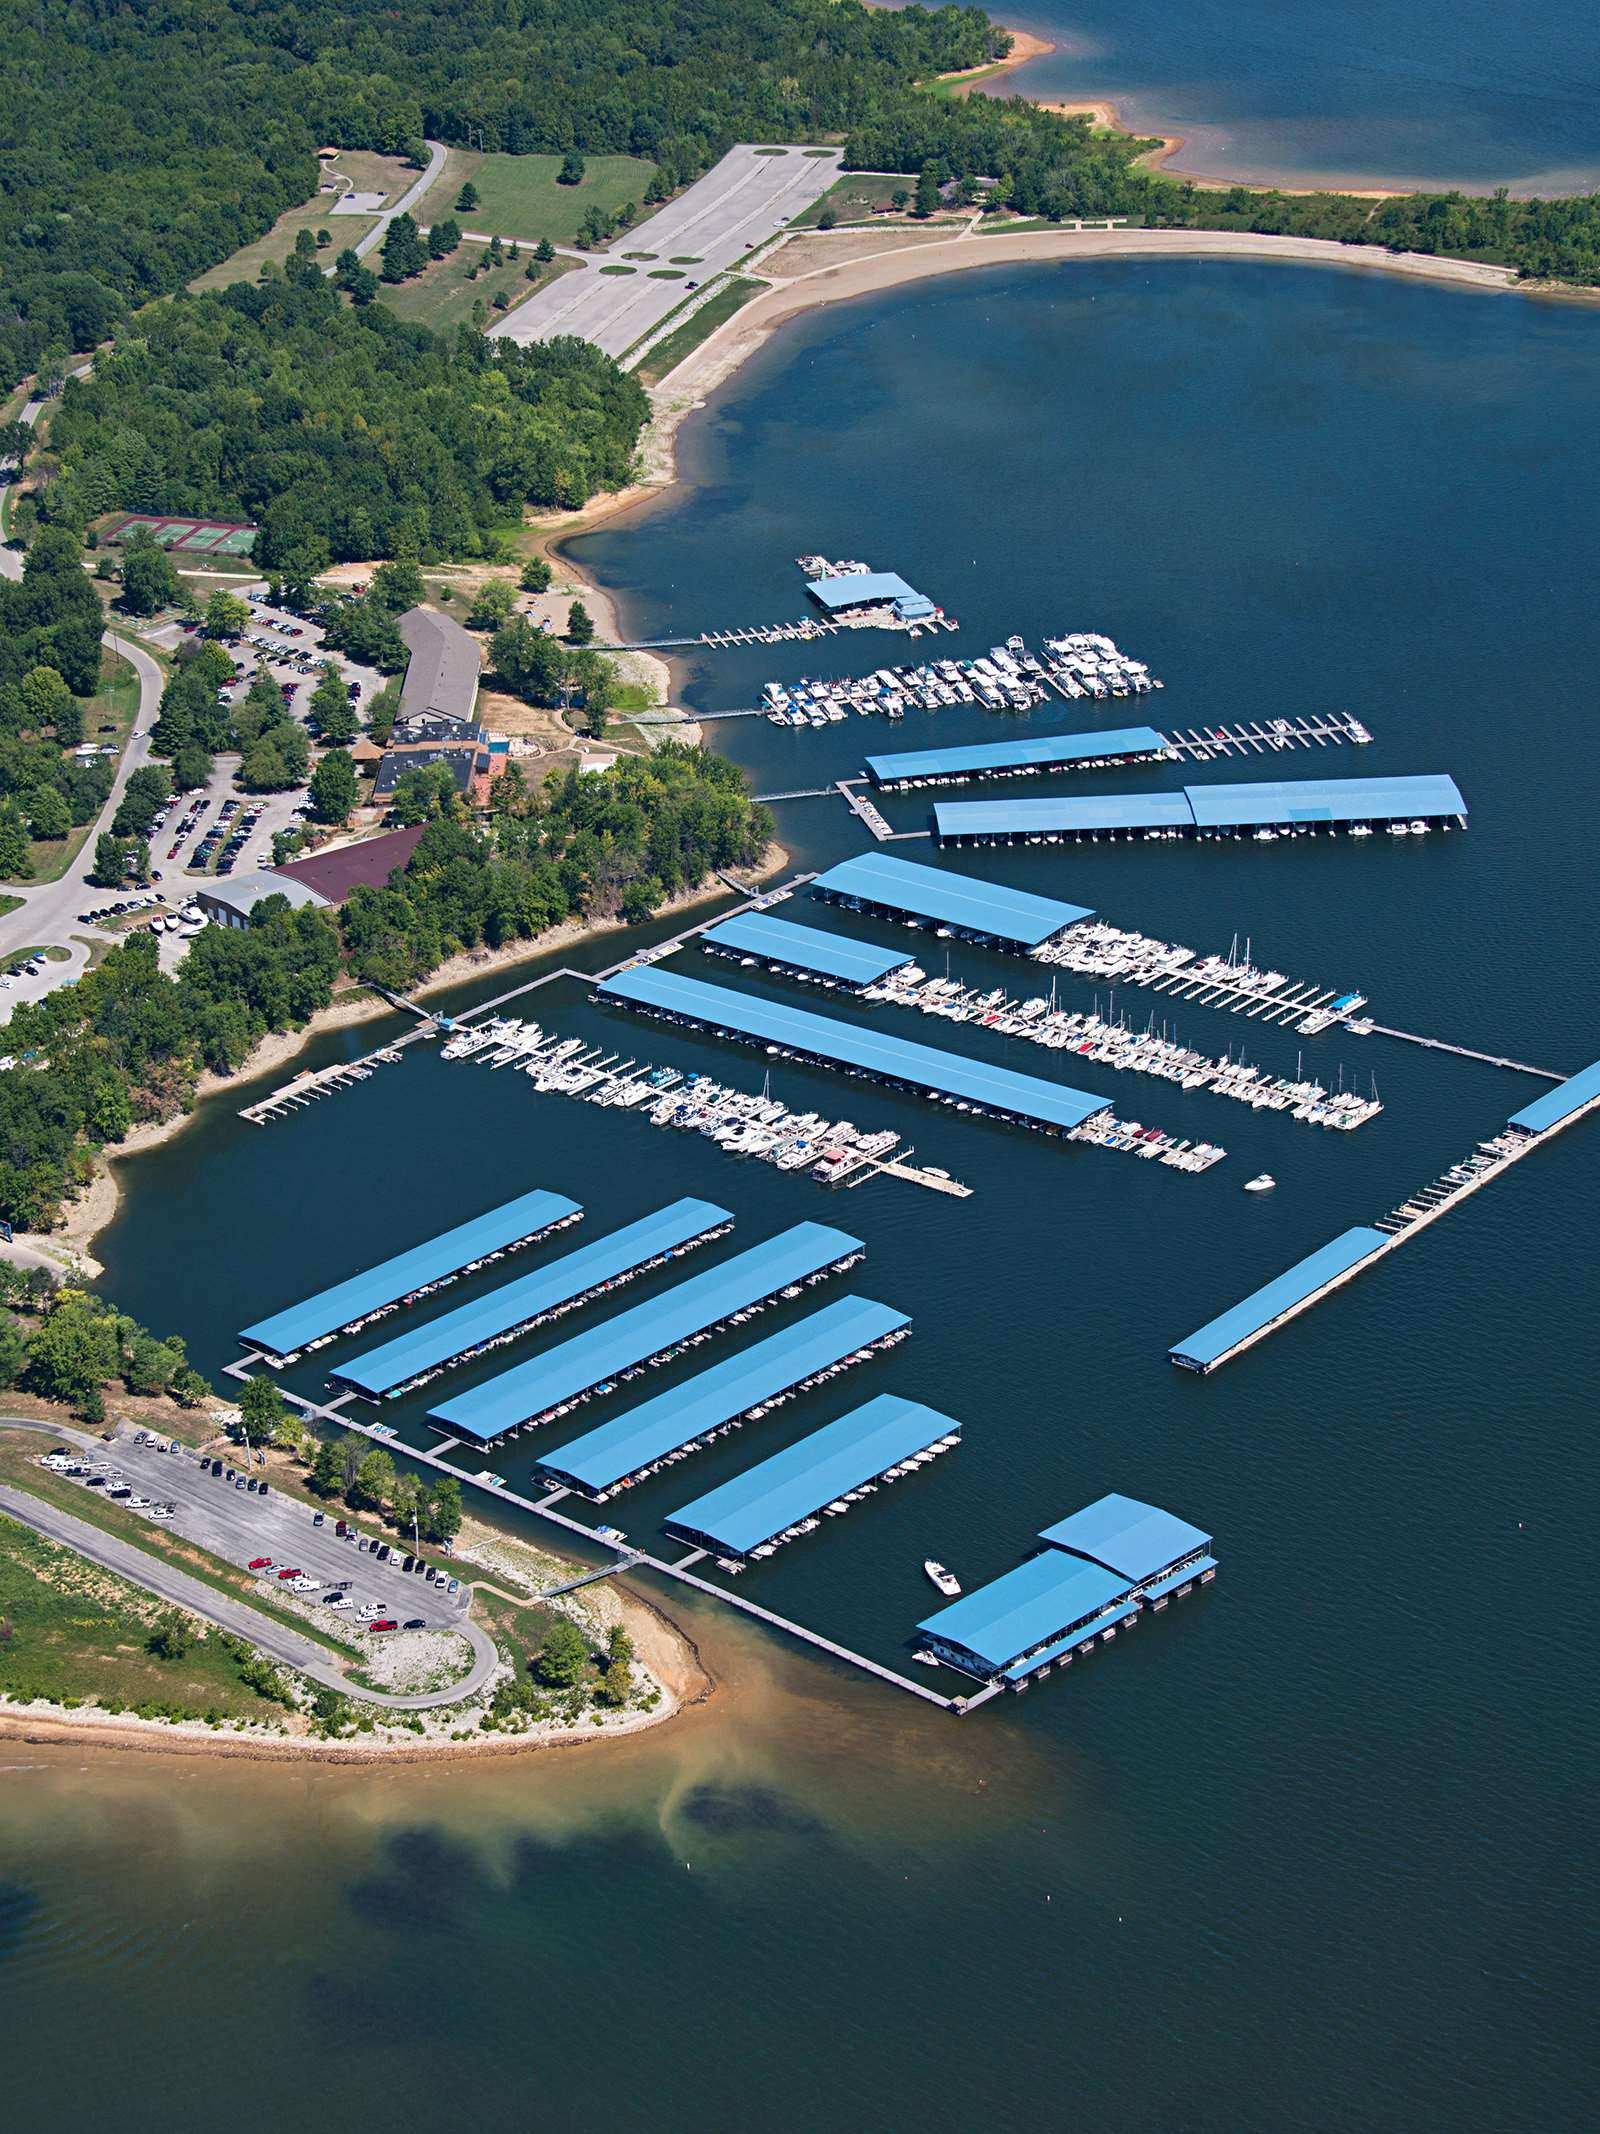 Fourwinds Lakeside Inn & Marina